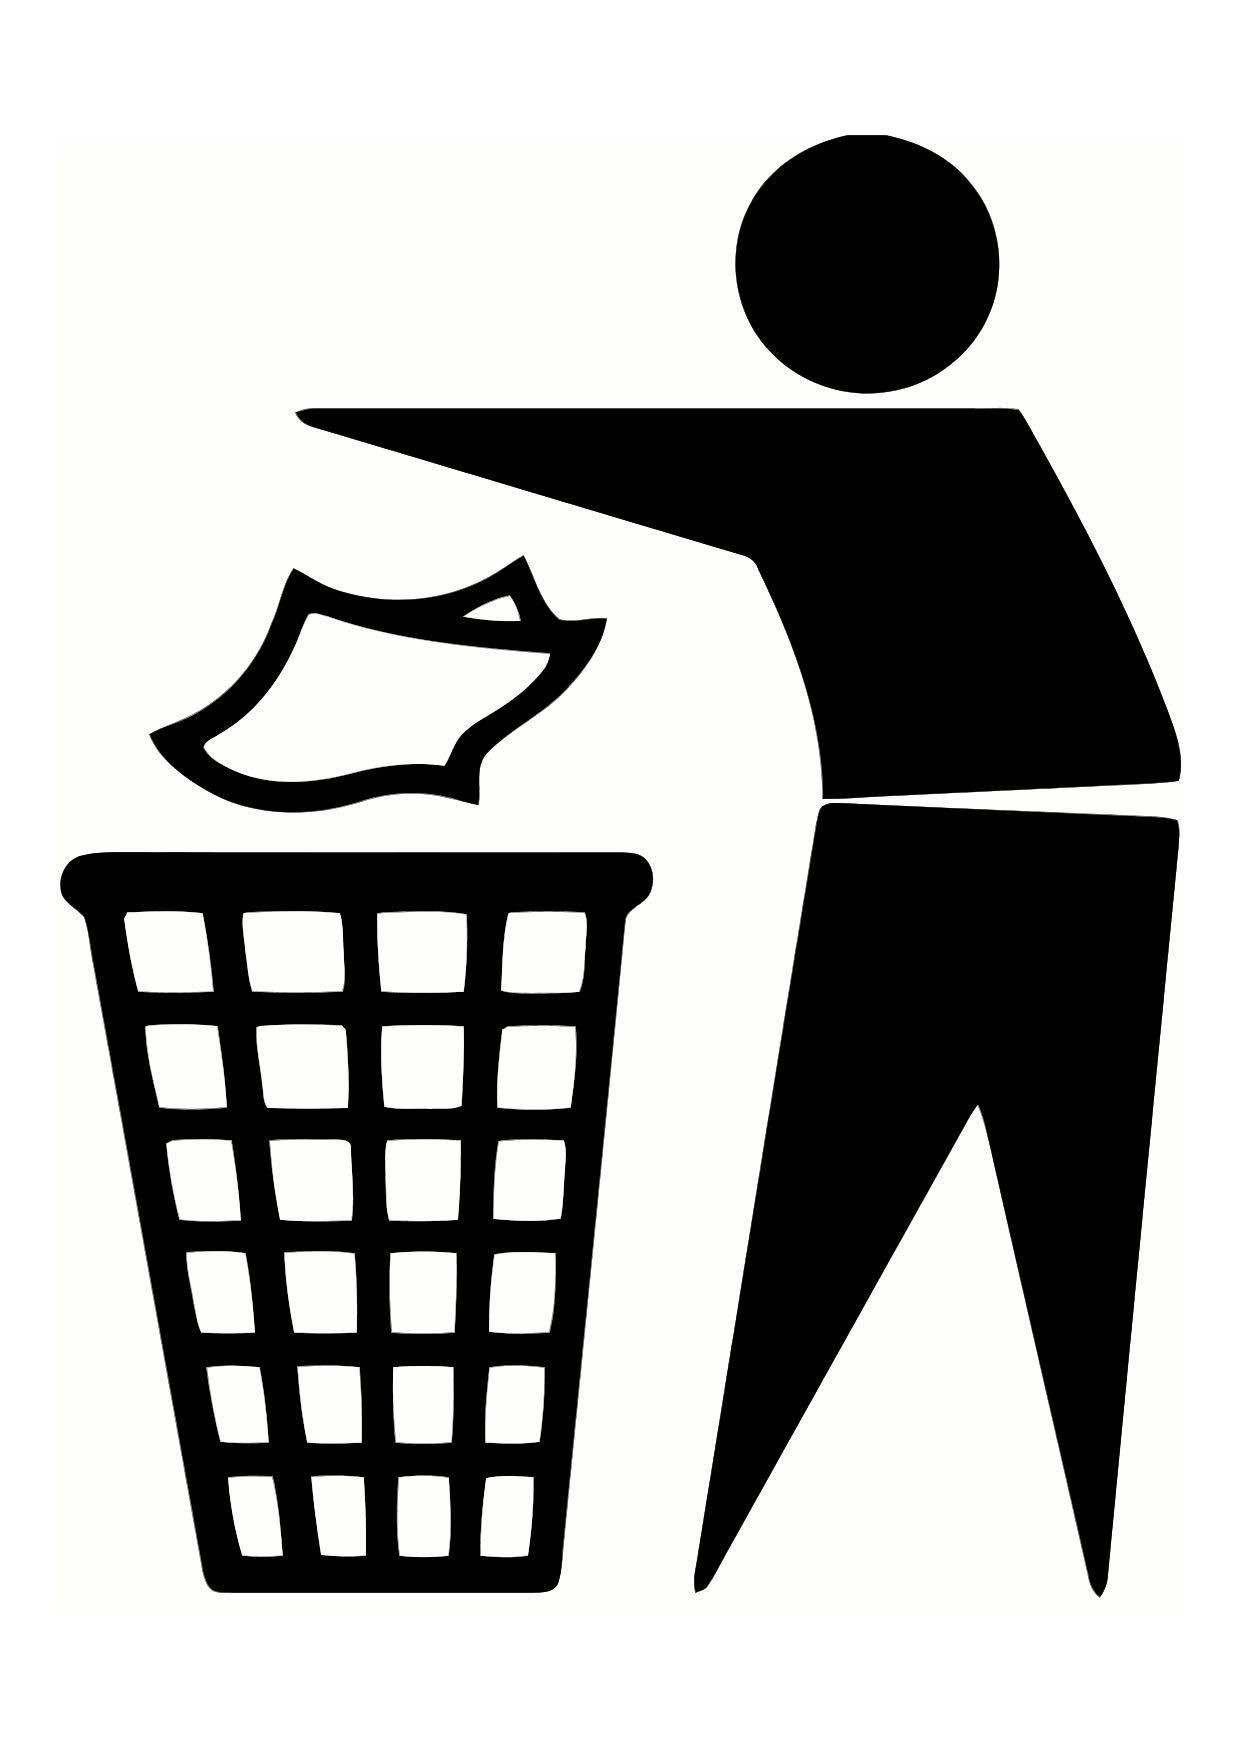 Waste bin clipart.